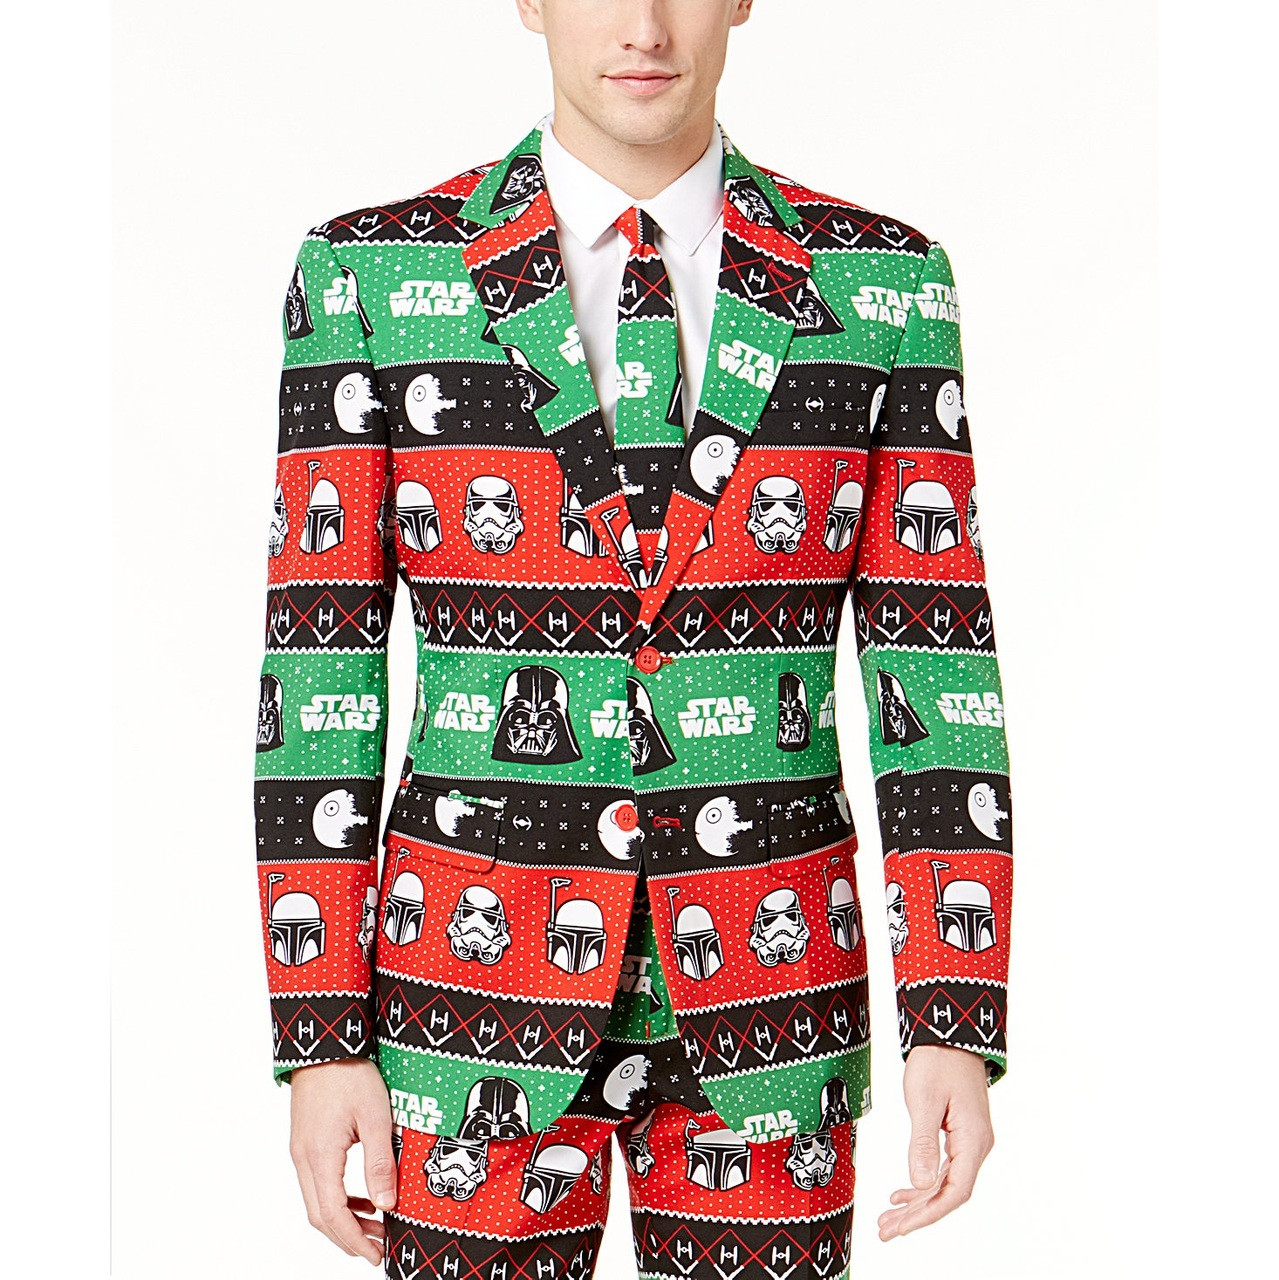 94e3e9498a820c Festive Force Star Wars Christmas Suit Canada | RetroFestive.ca